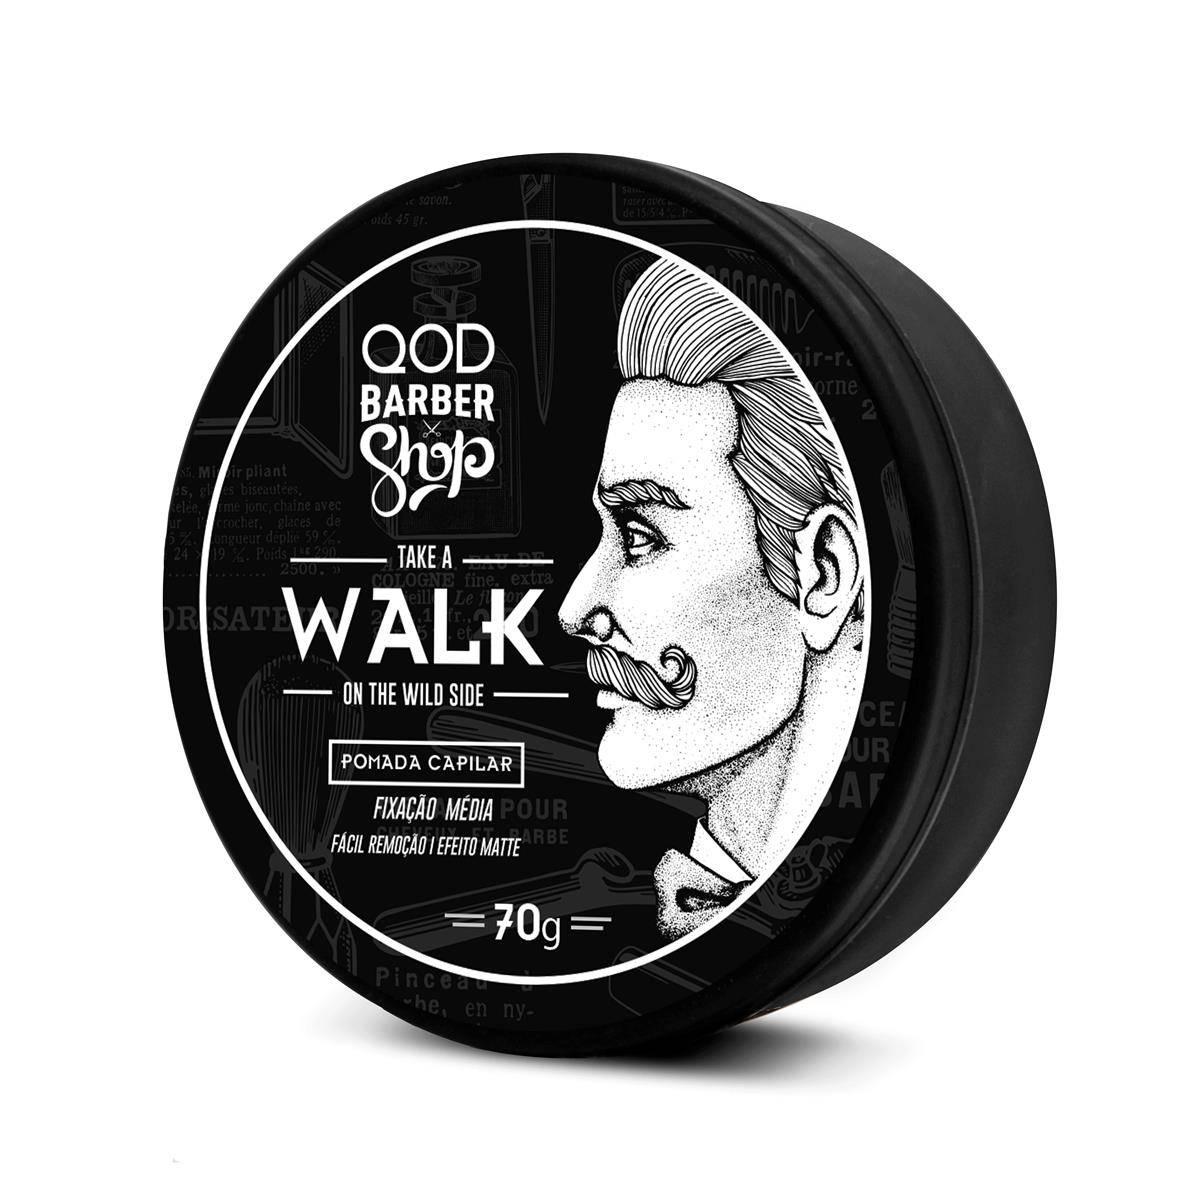 Pomada para Cabelo Walk QOD Barber Shop - 70g